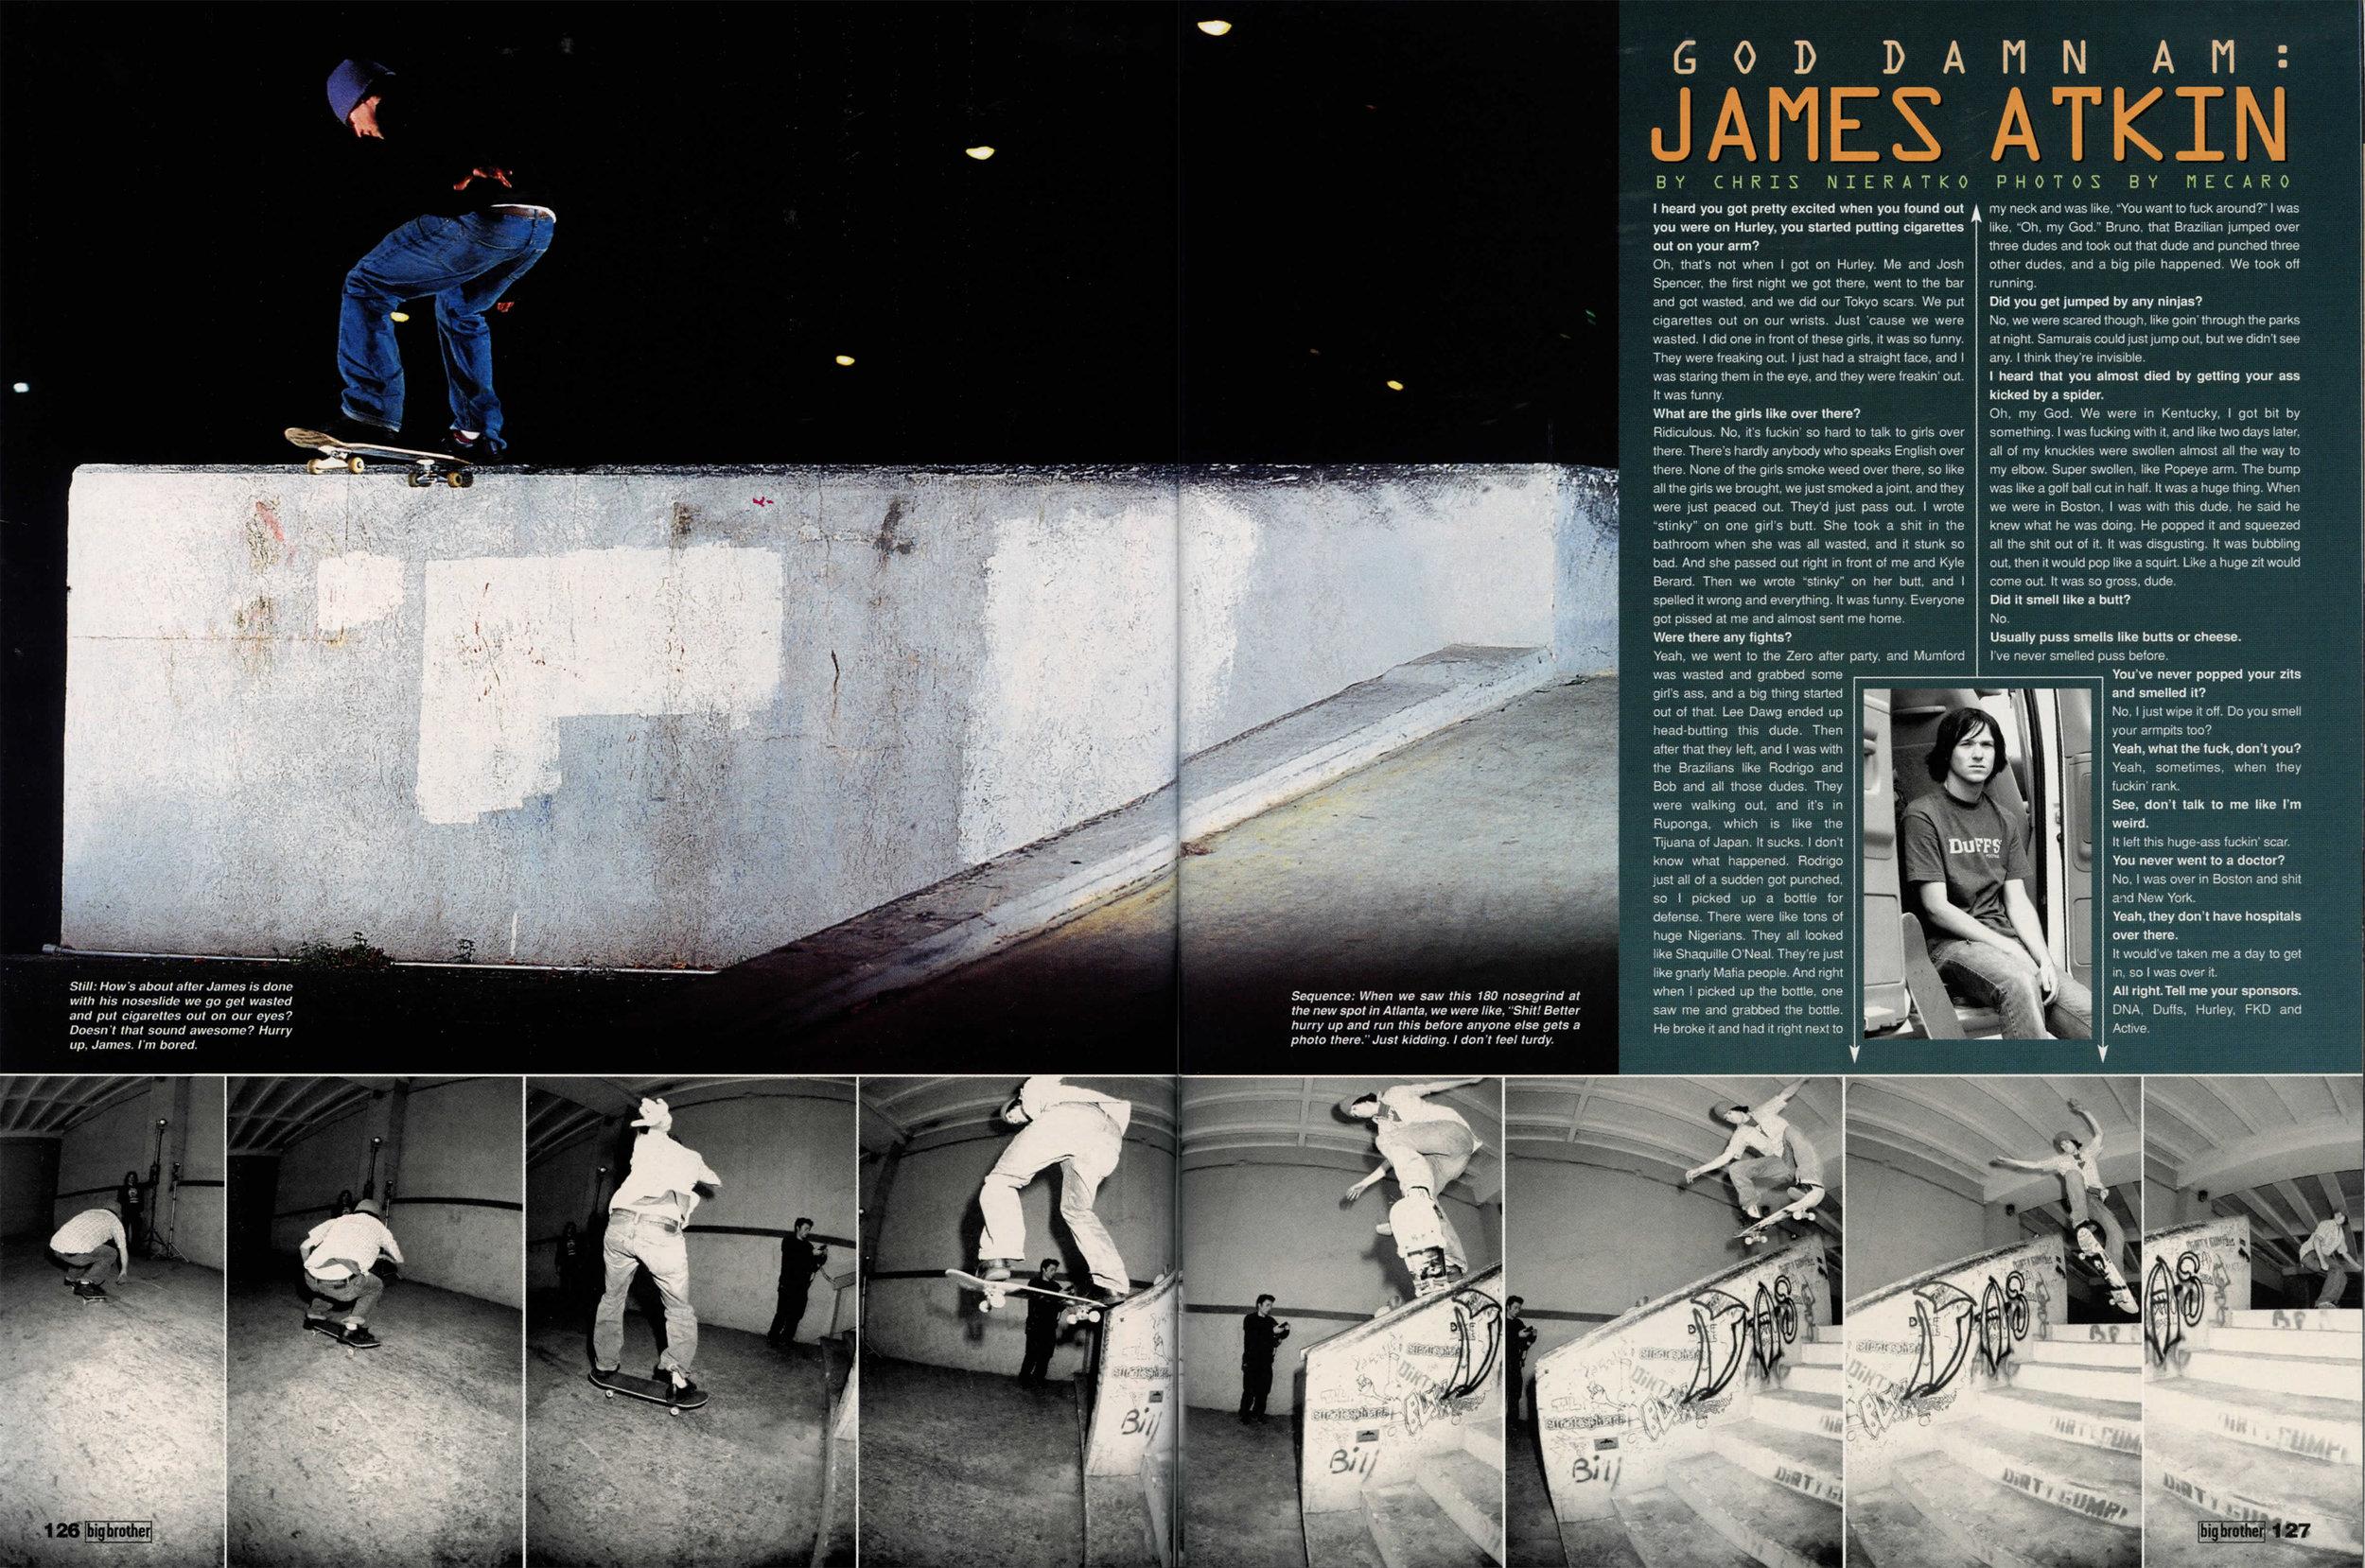 Big-Brother-February-2003--93-Damn-Am-James-Atkin-high.jpg